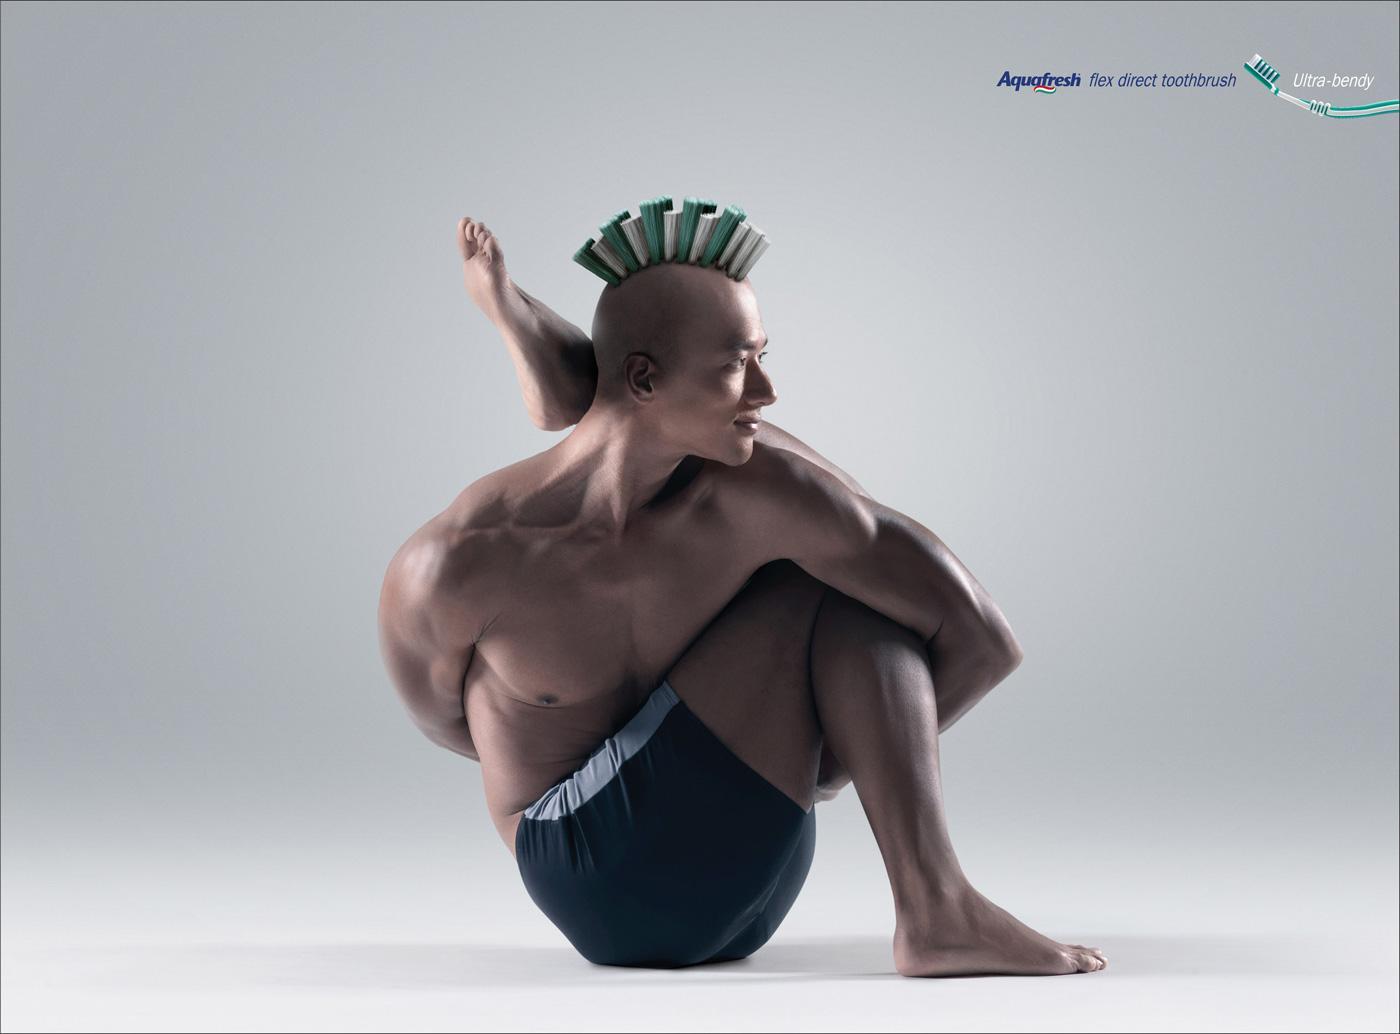 Aquafresh Print Ad -  Ultra-bendy, 3